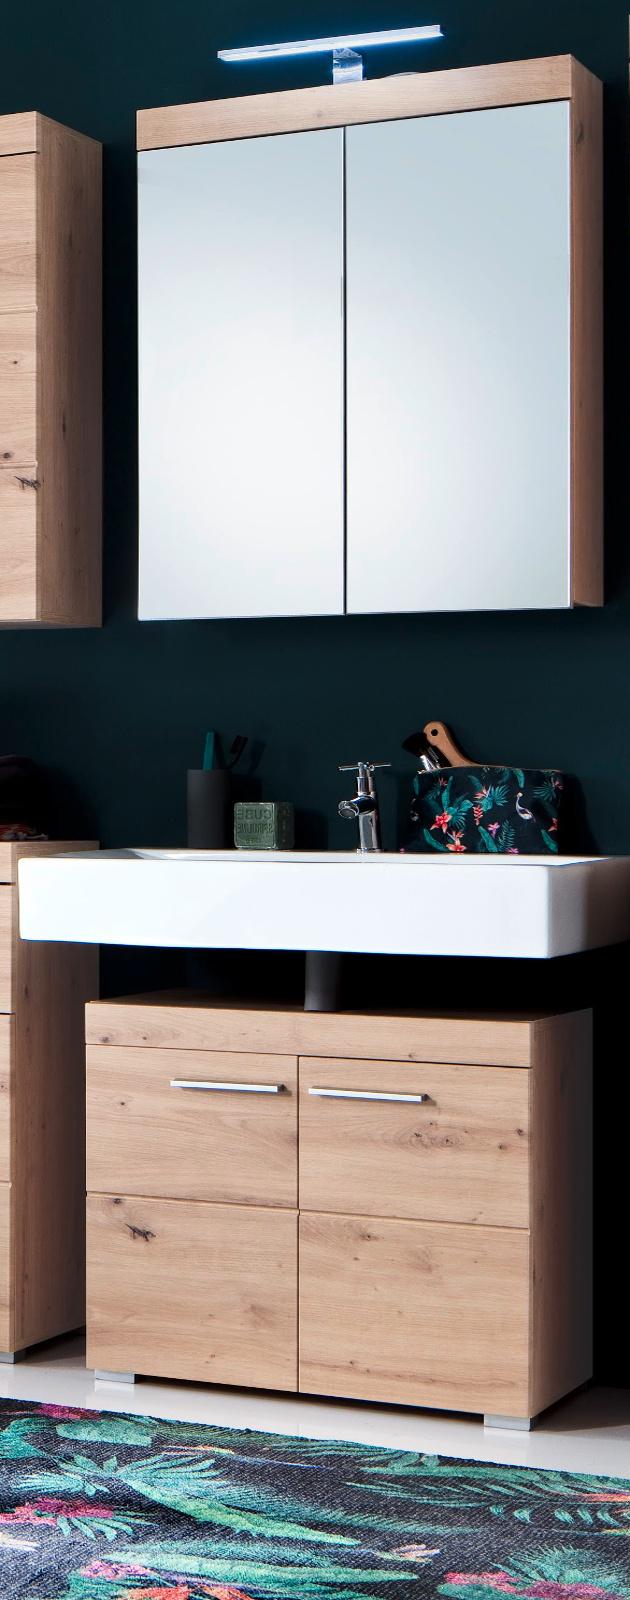 hochbett etagenbett schreibtisch wei mixxi19 designerm bel moderne m bel owl. Black Bedroom Furniture Sets. Home Design Ideas